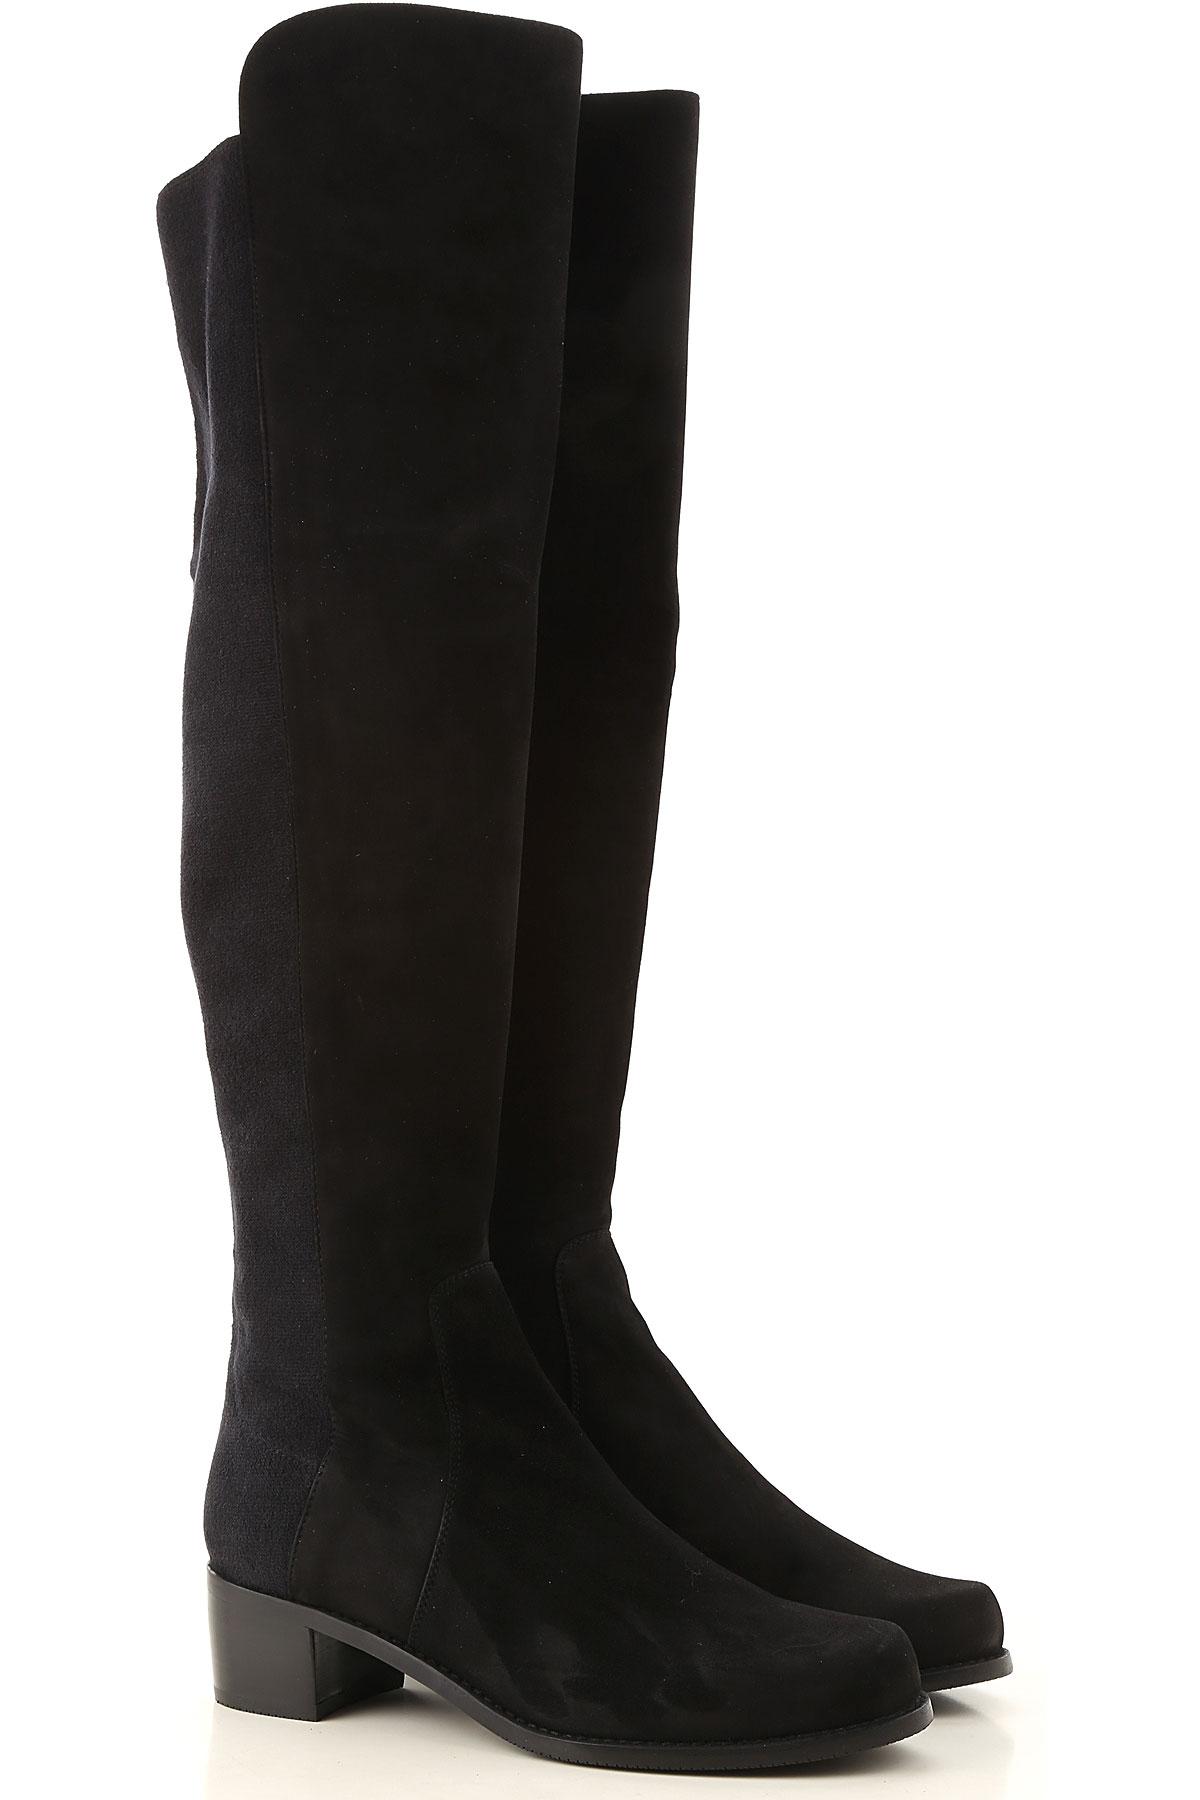 Stuart Weitzman Boots for Women, Booties On Sale, Black, Suede leather, 2019, US 5.5 (EU 36) US 7 (EU 37.5) US 7.5 (EU 38)